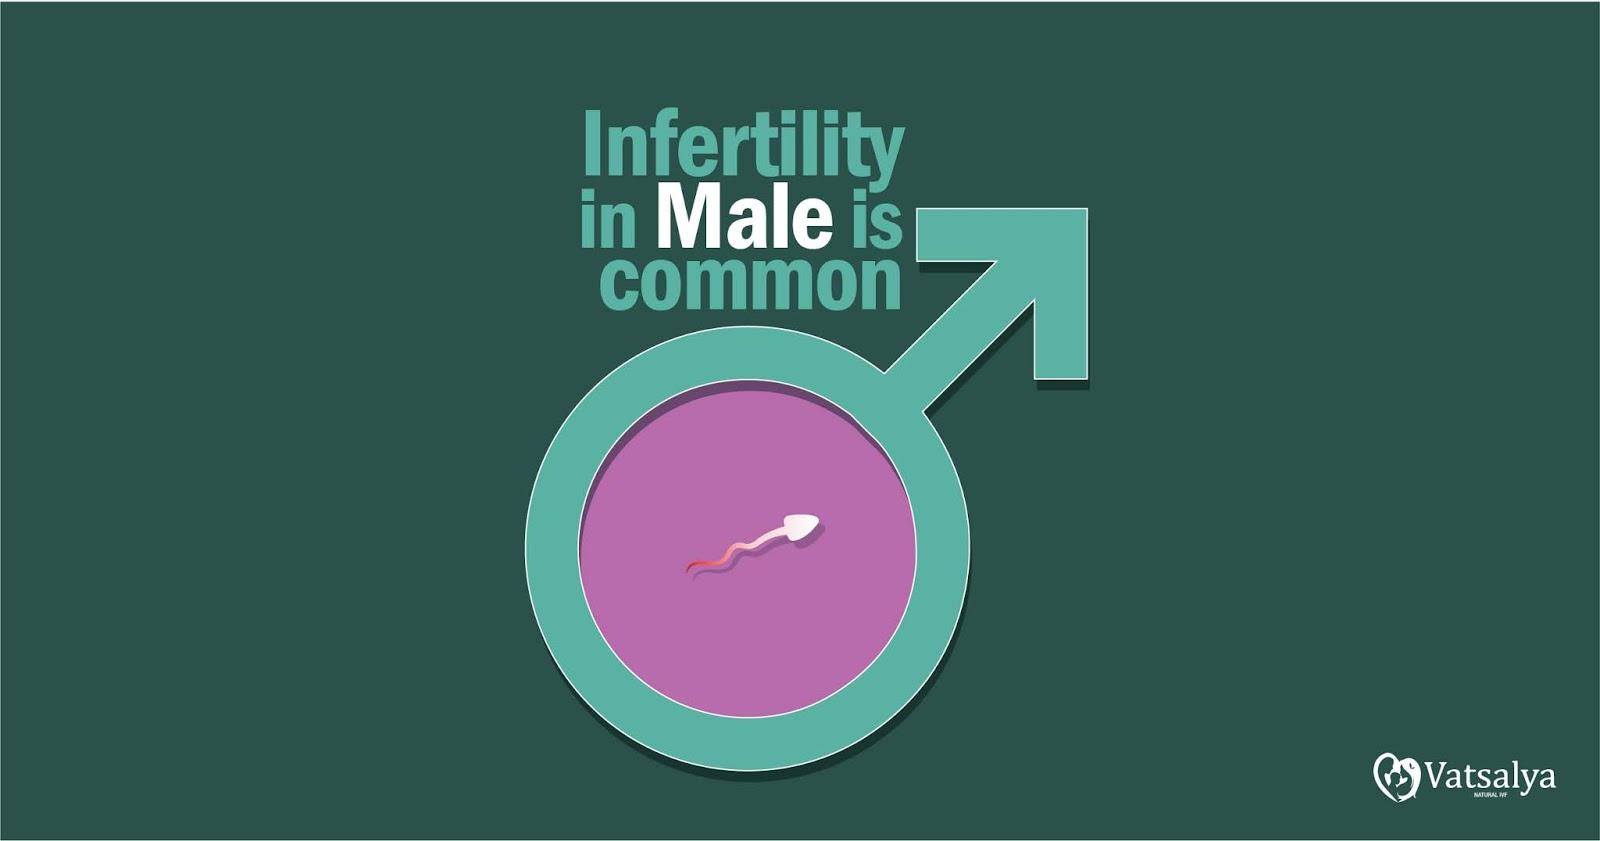 Infertility in Male is Common